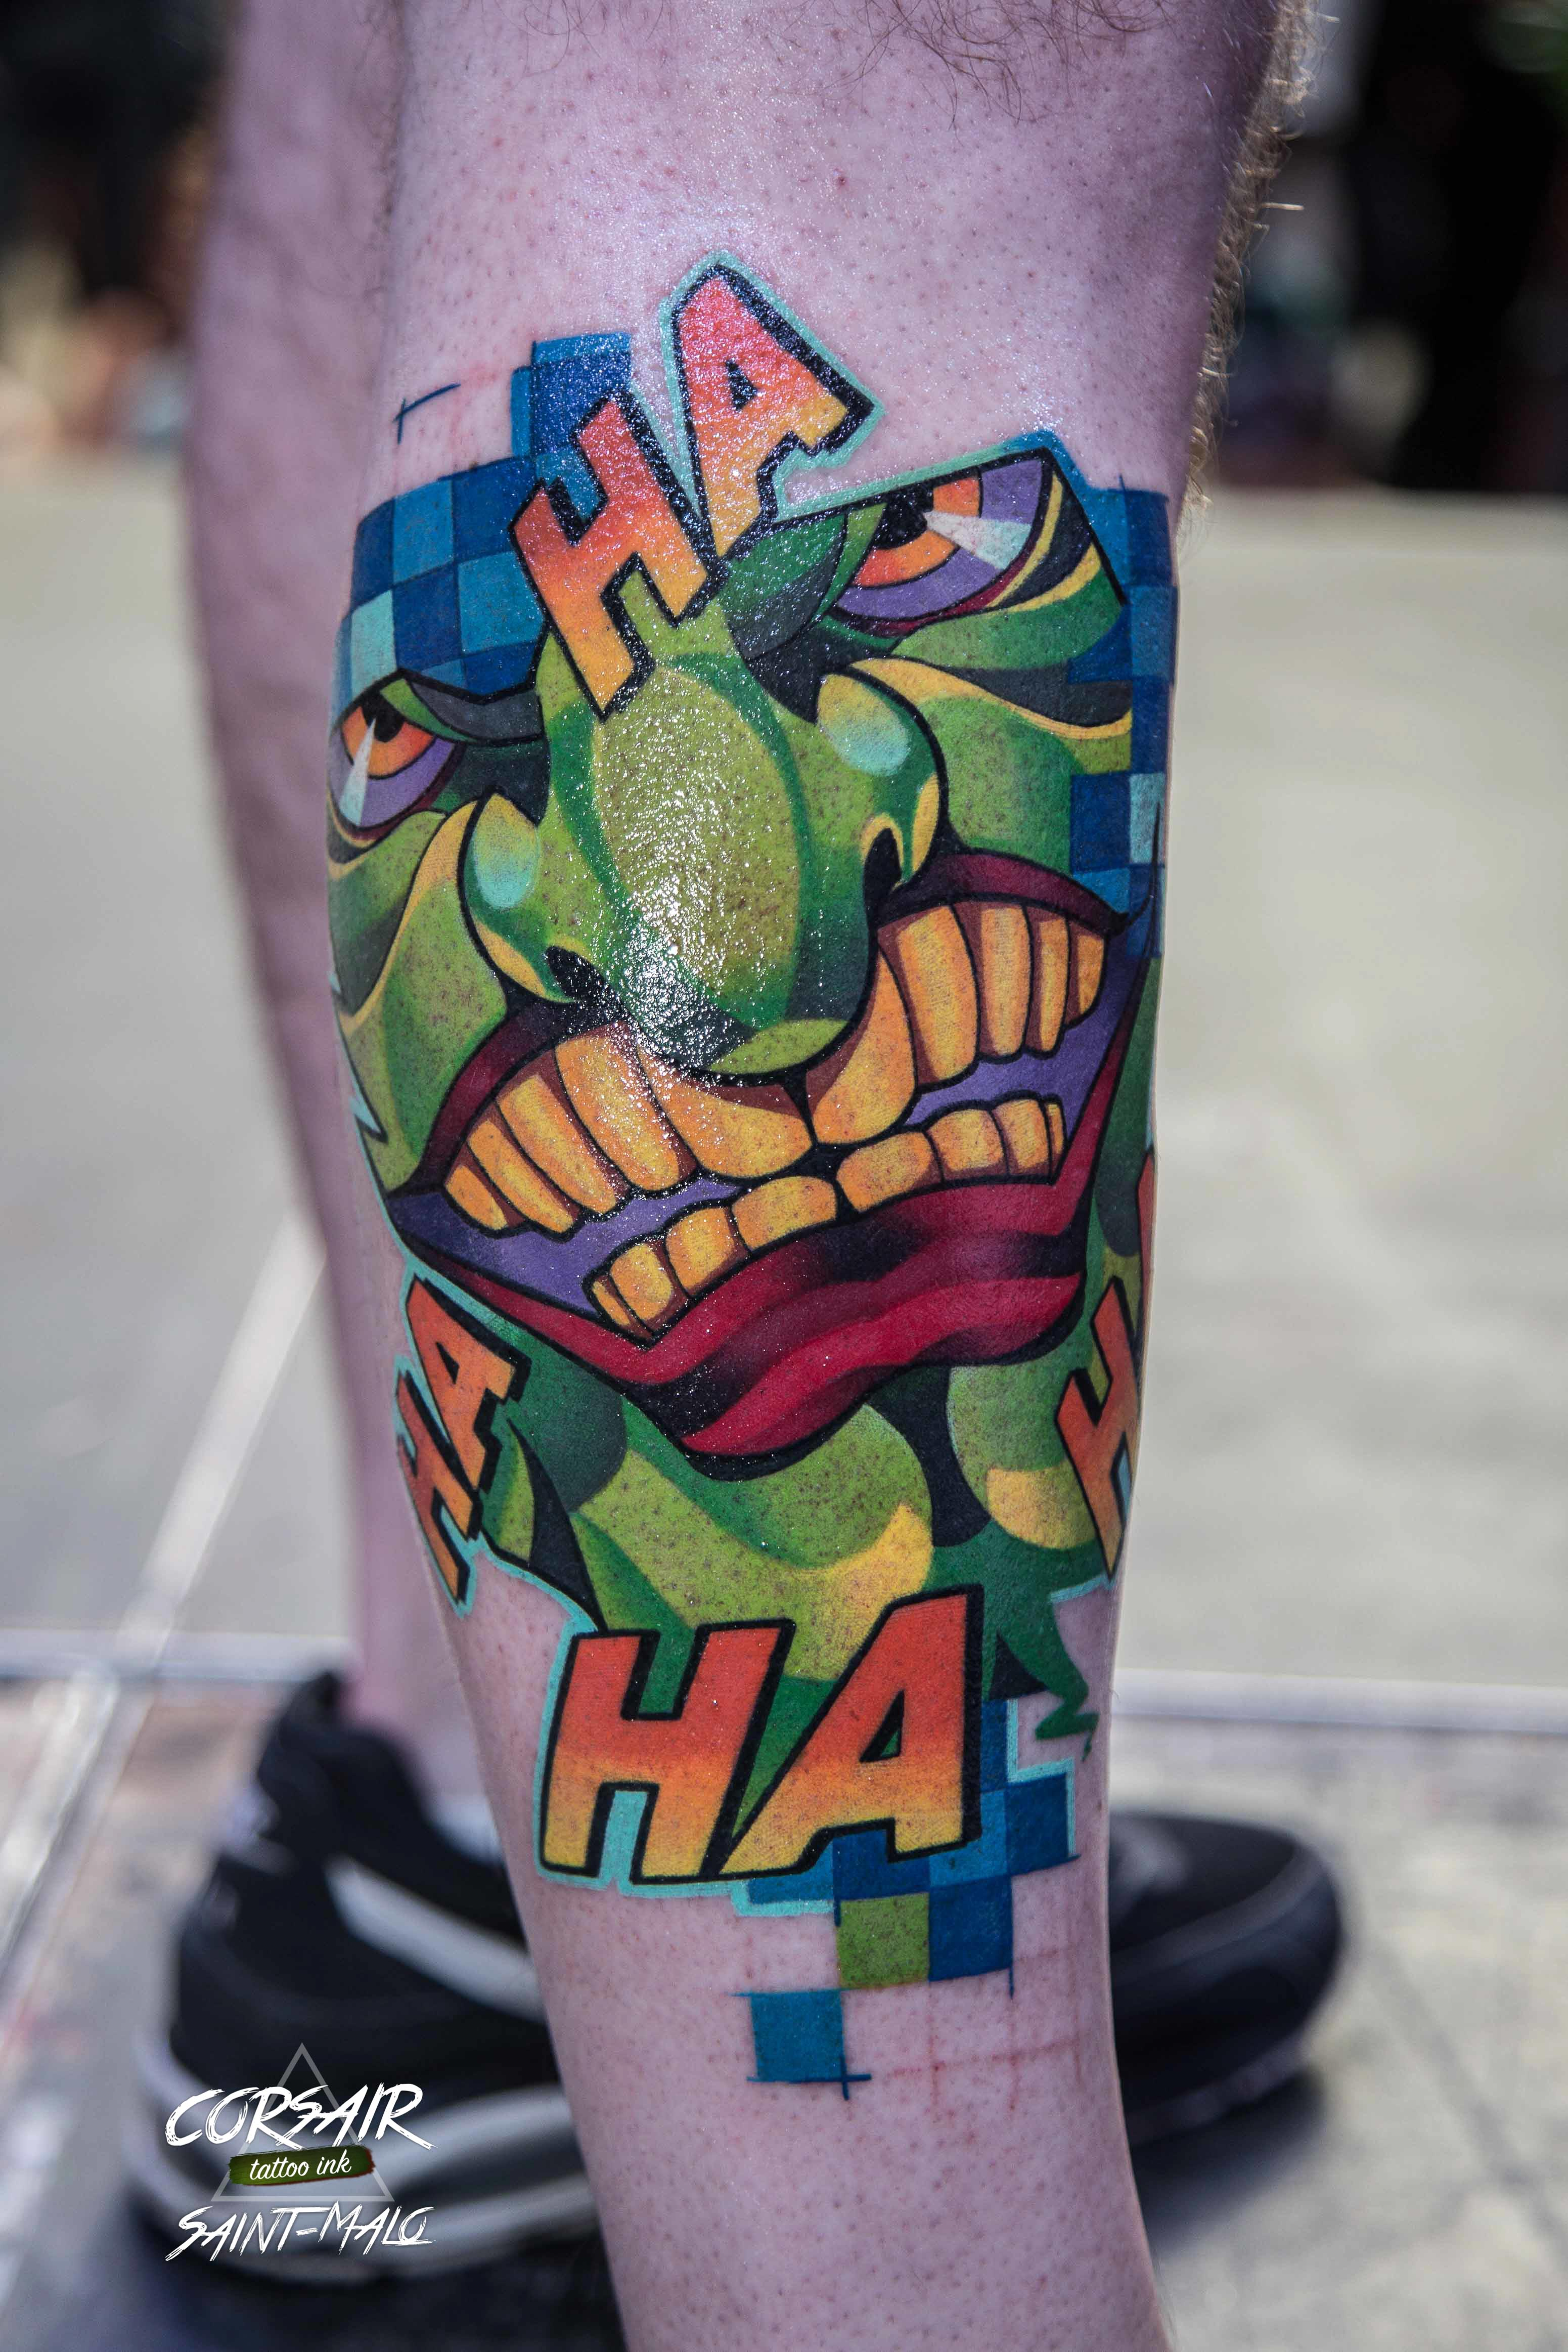 convention-tatouage-saint-malo-bretagne-corsair-tattoo-ink-tattoo-clown-joker